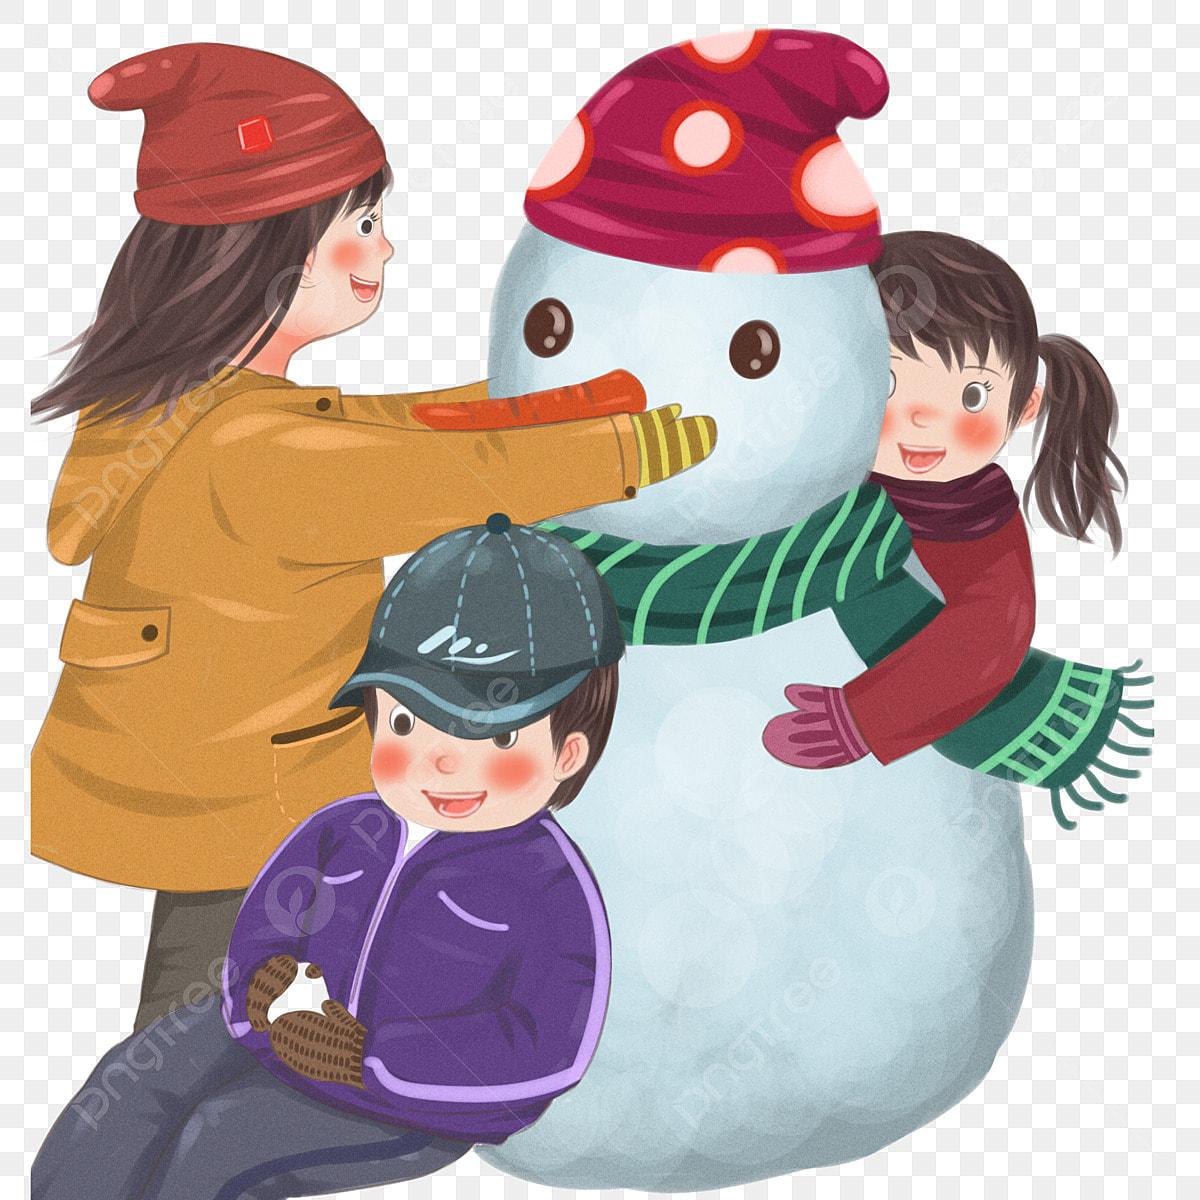 Children making snowman in the field - Download Free Vectors, Clipart  Graphics & Vector Art